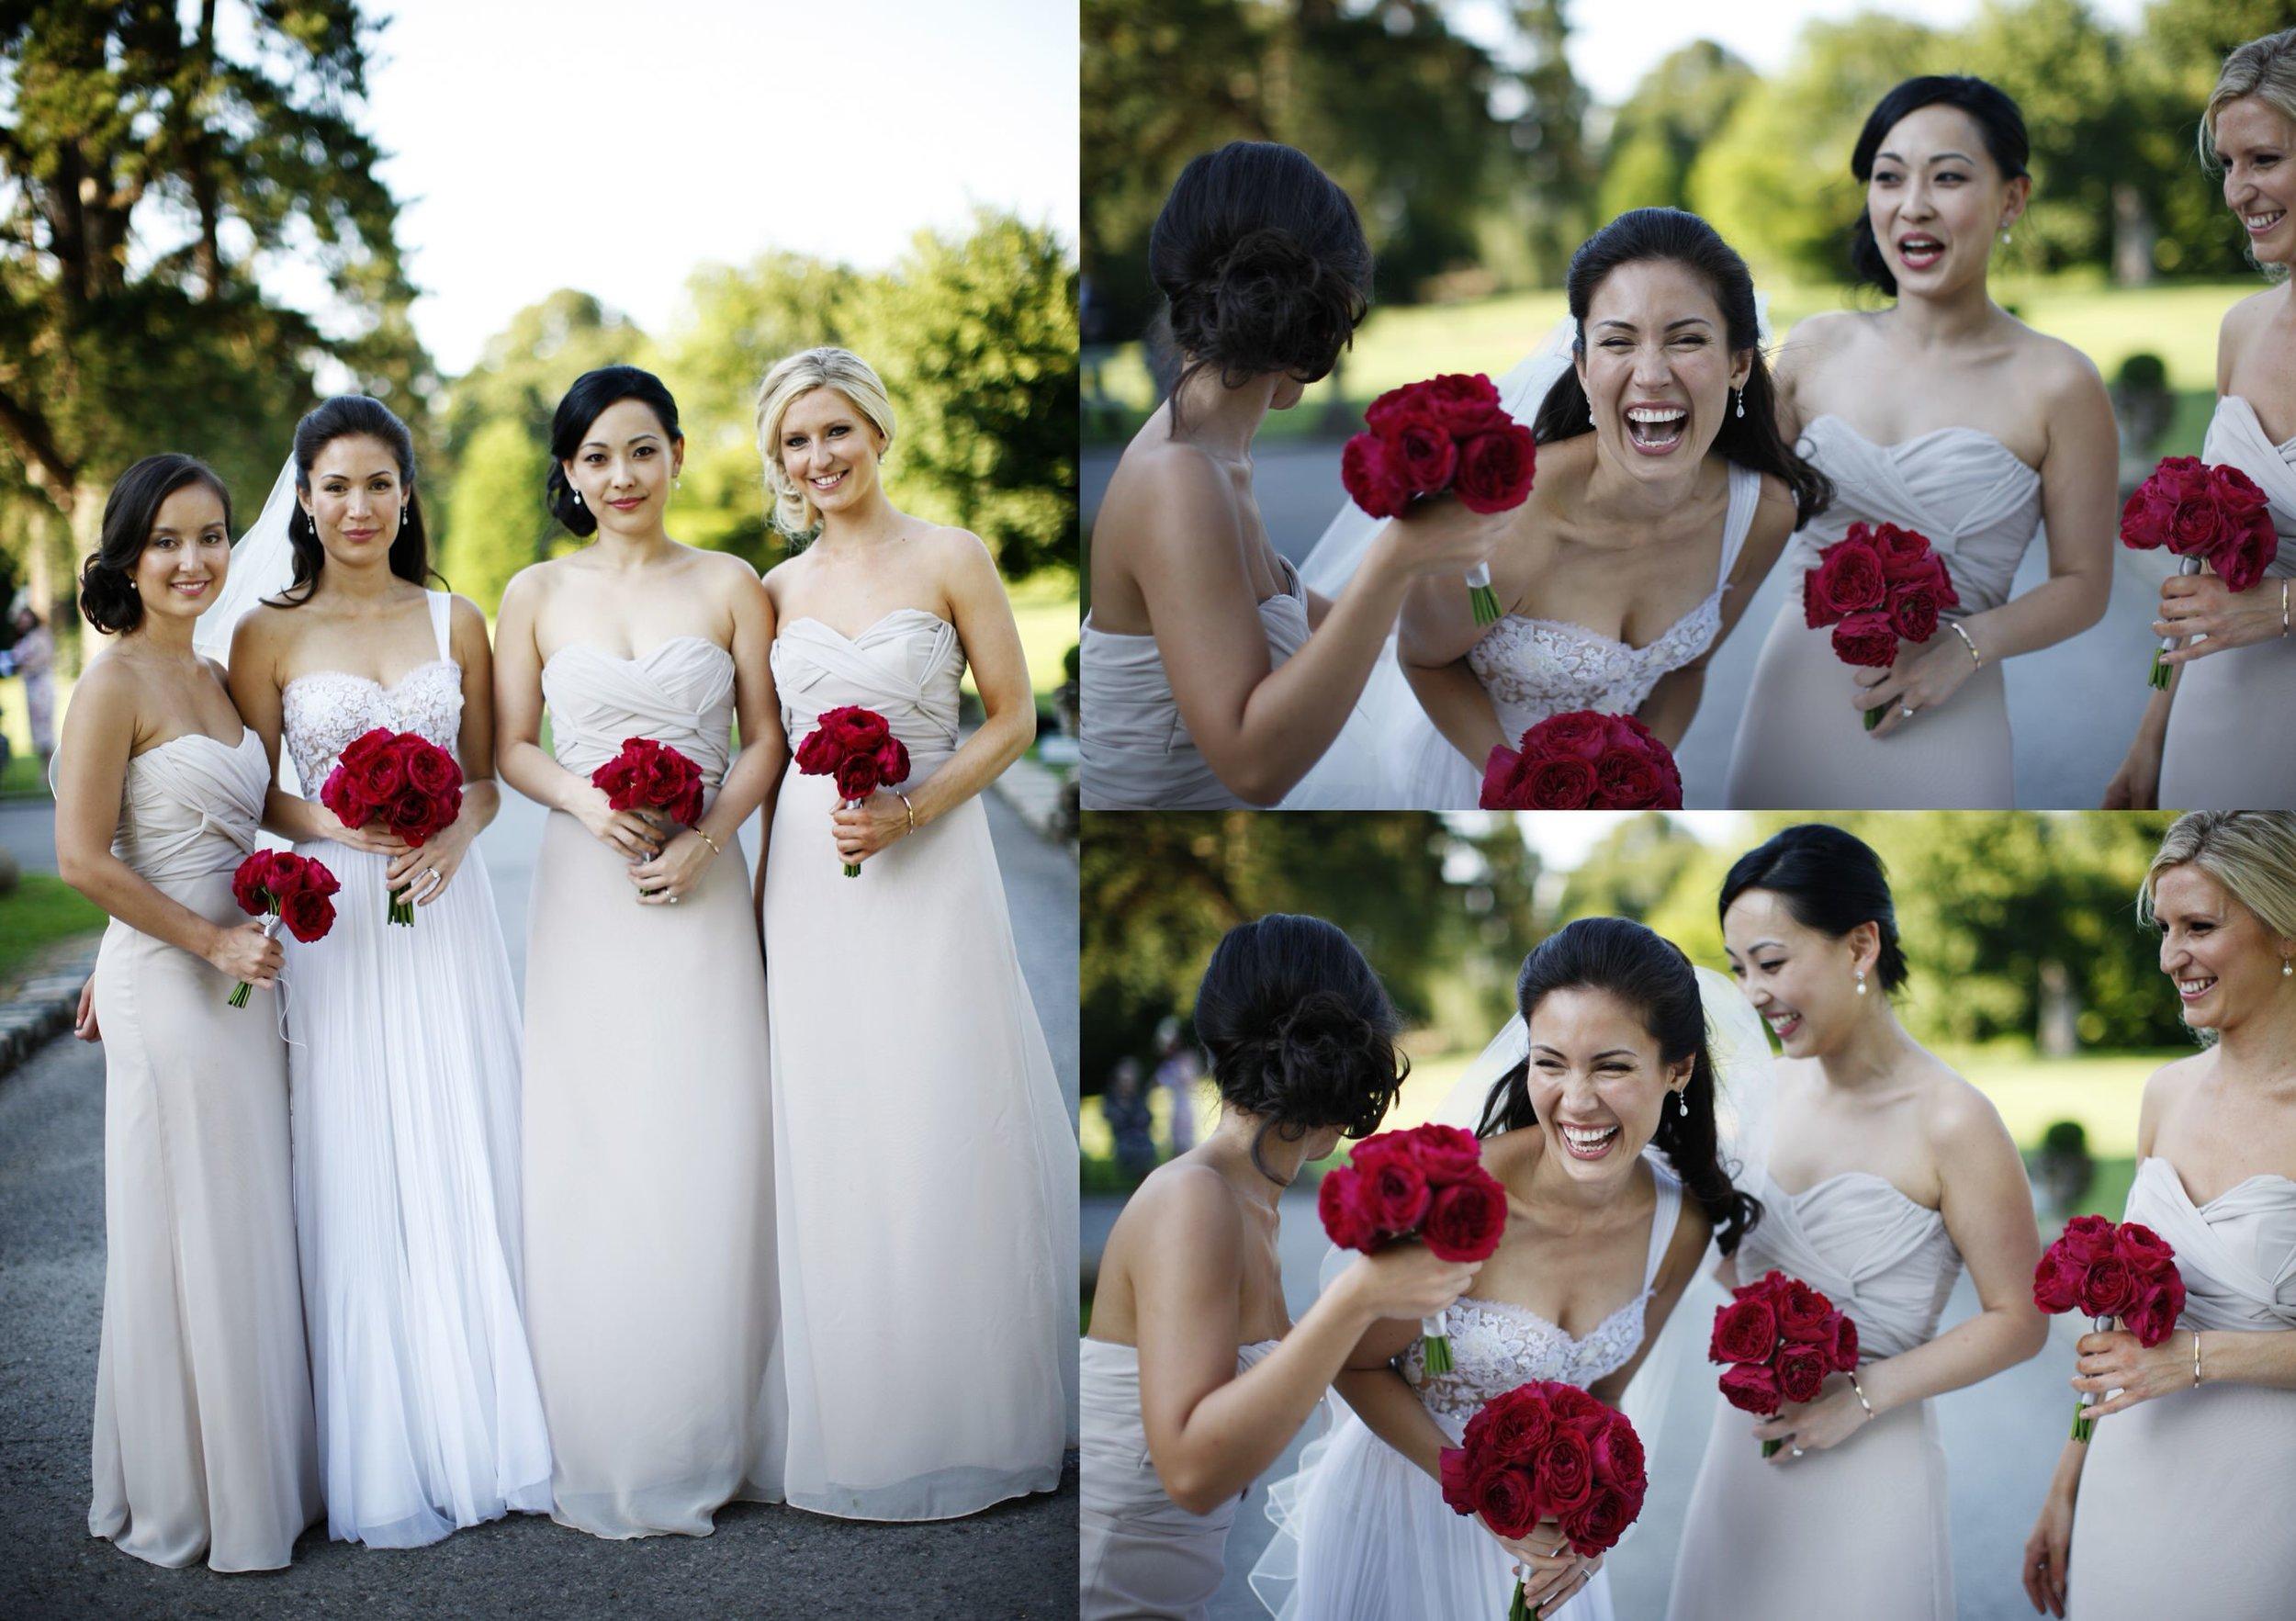 summer-wedding-babington-house-london-weddings_0019.jpg